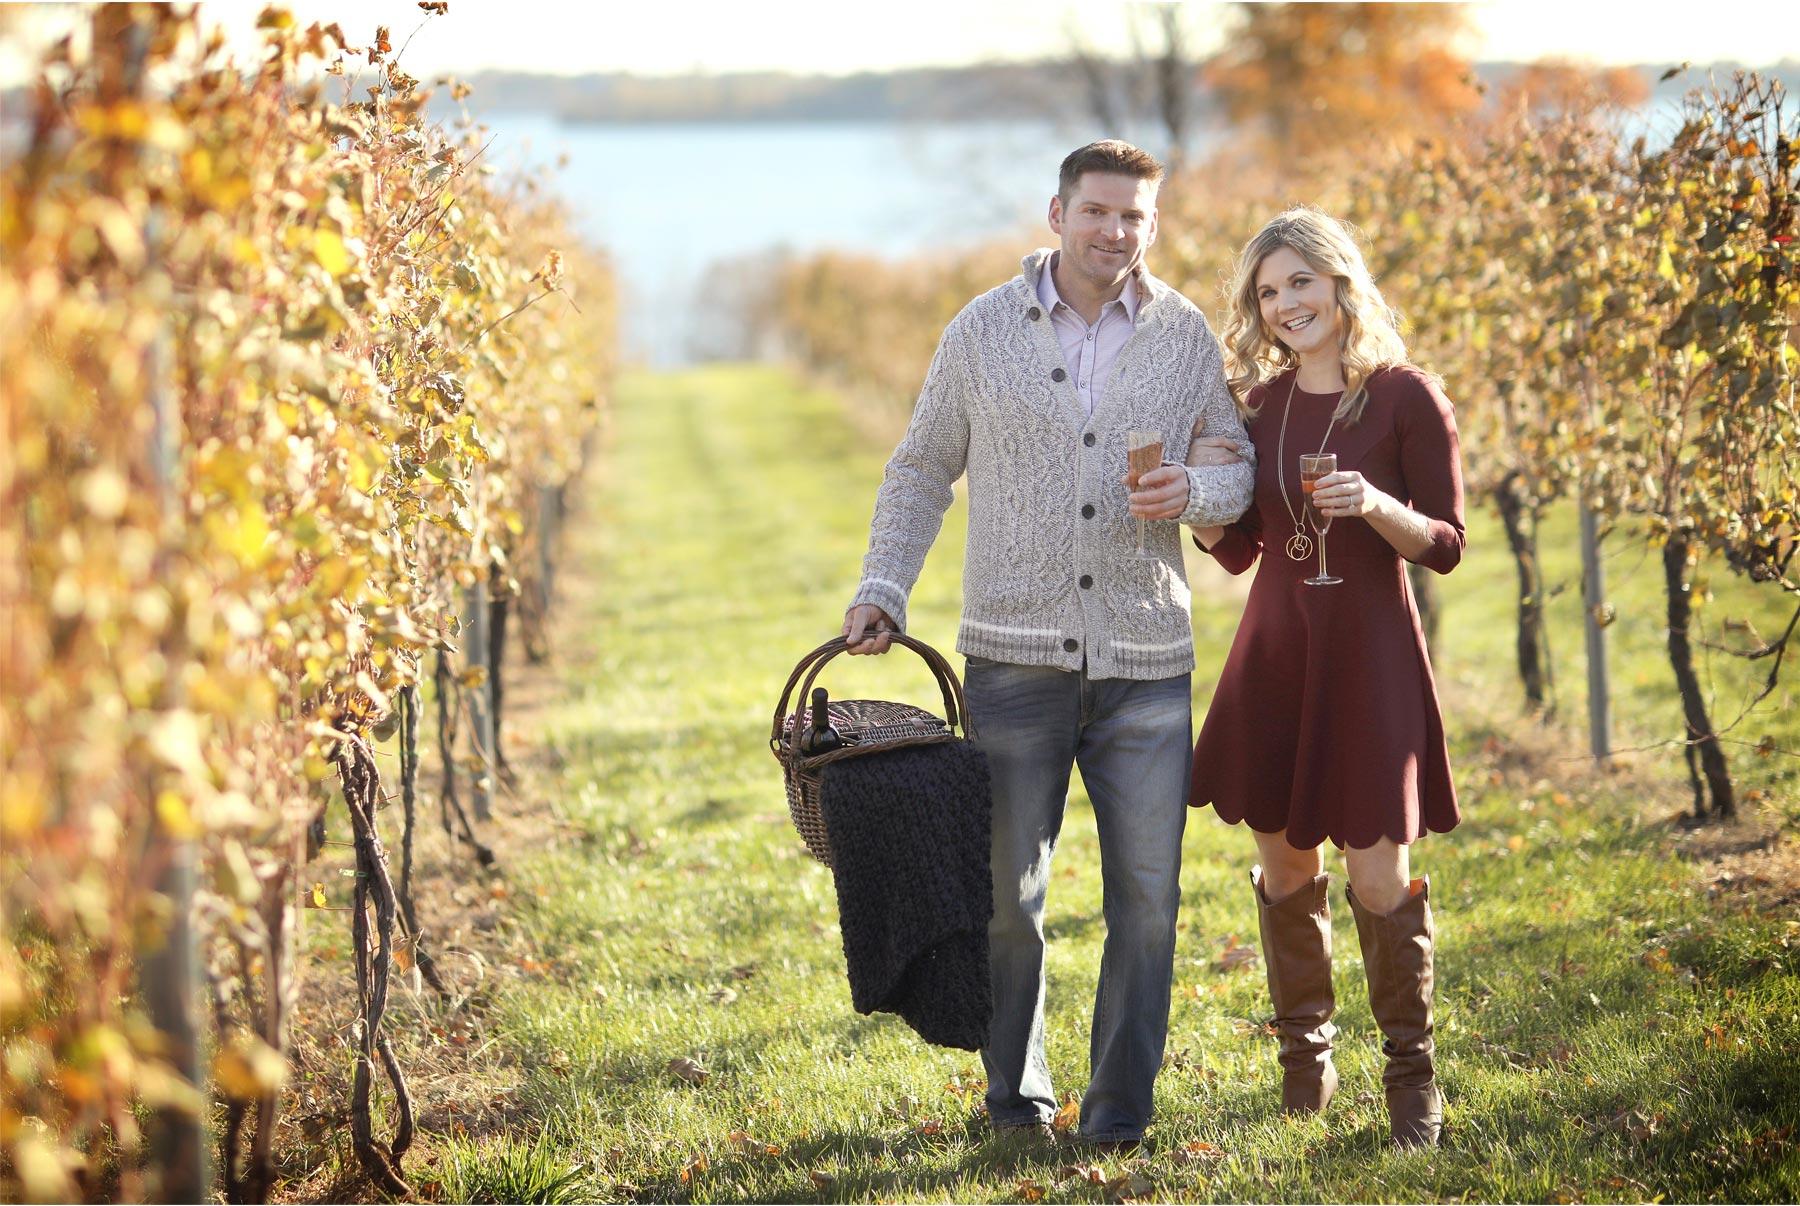 04-Vick-Photography-Destination-Engagement-Session-Wine-Picnic-Vineyard-Katie-and-Bob.jpg